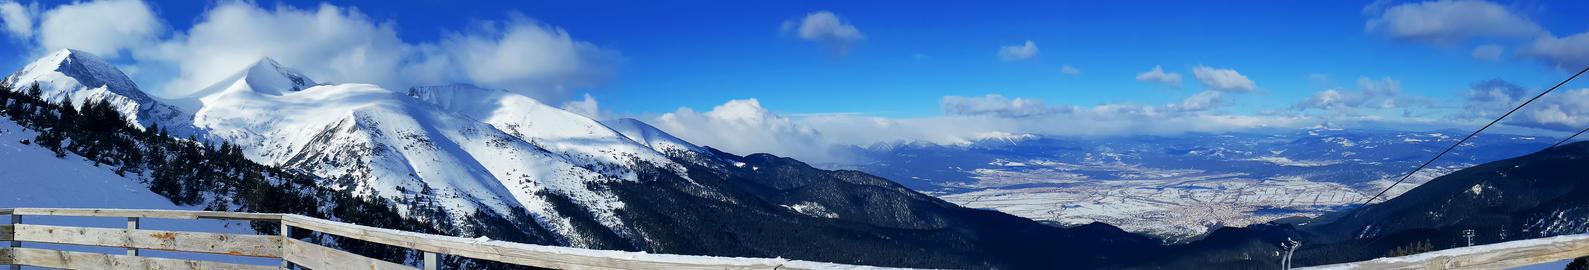 Mount panorama フォト